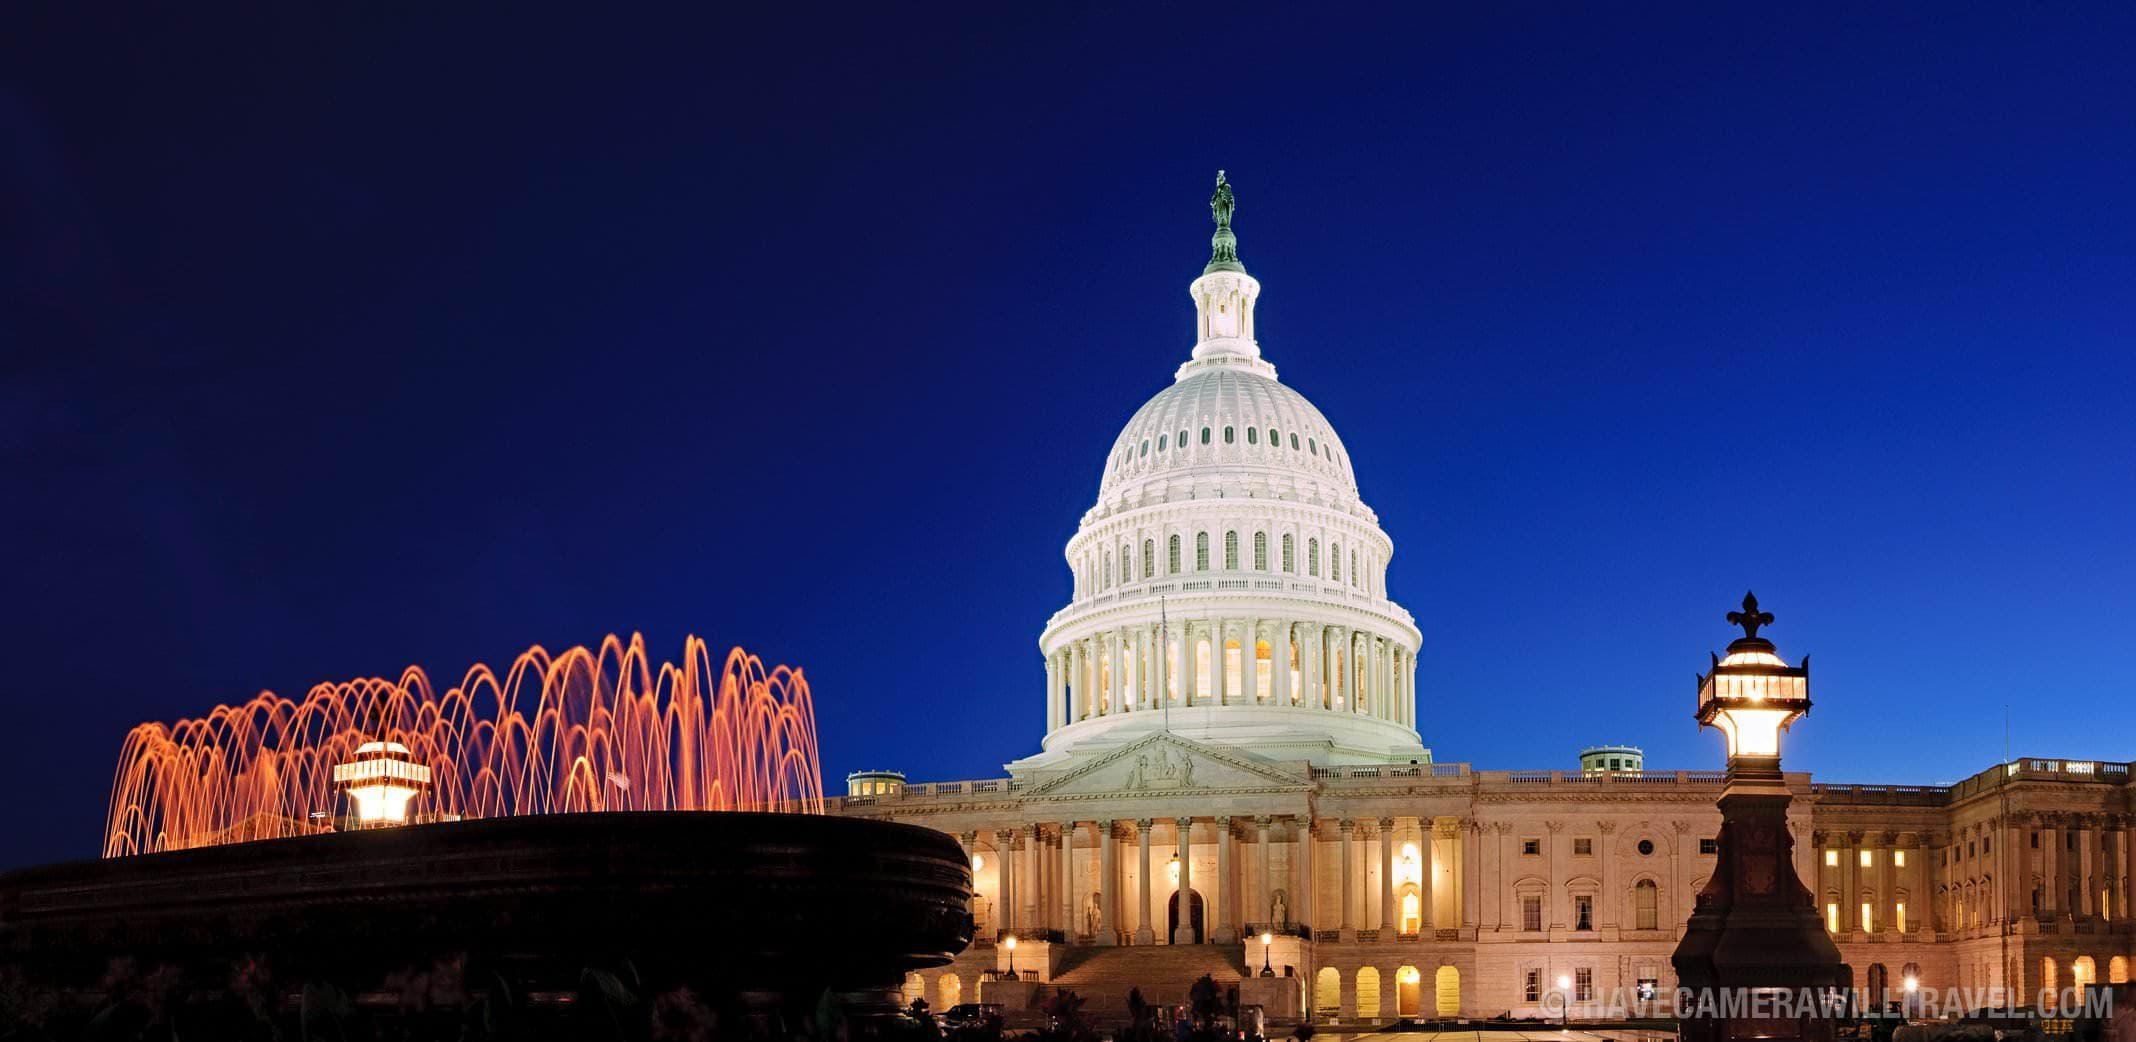 US Capitol Building at night panorama